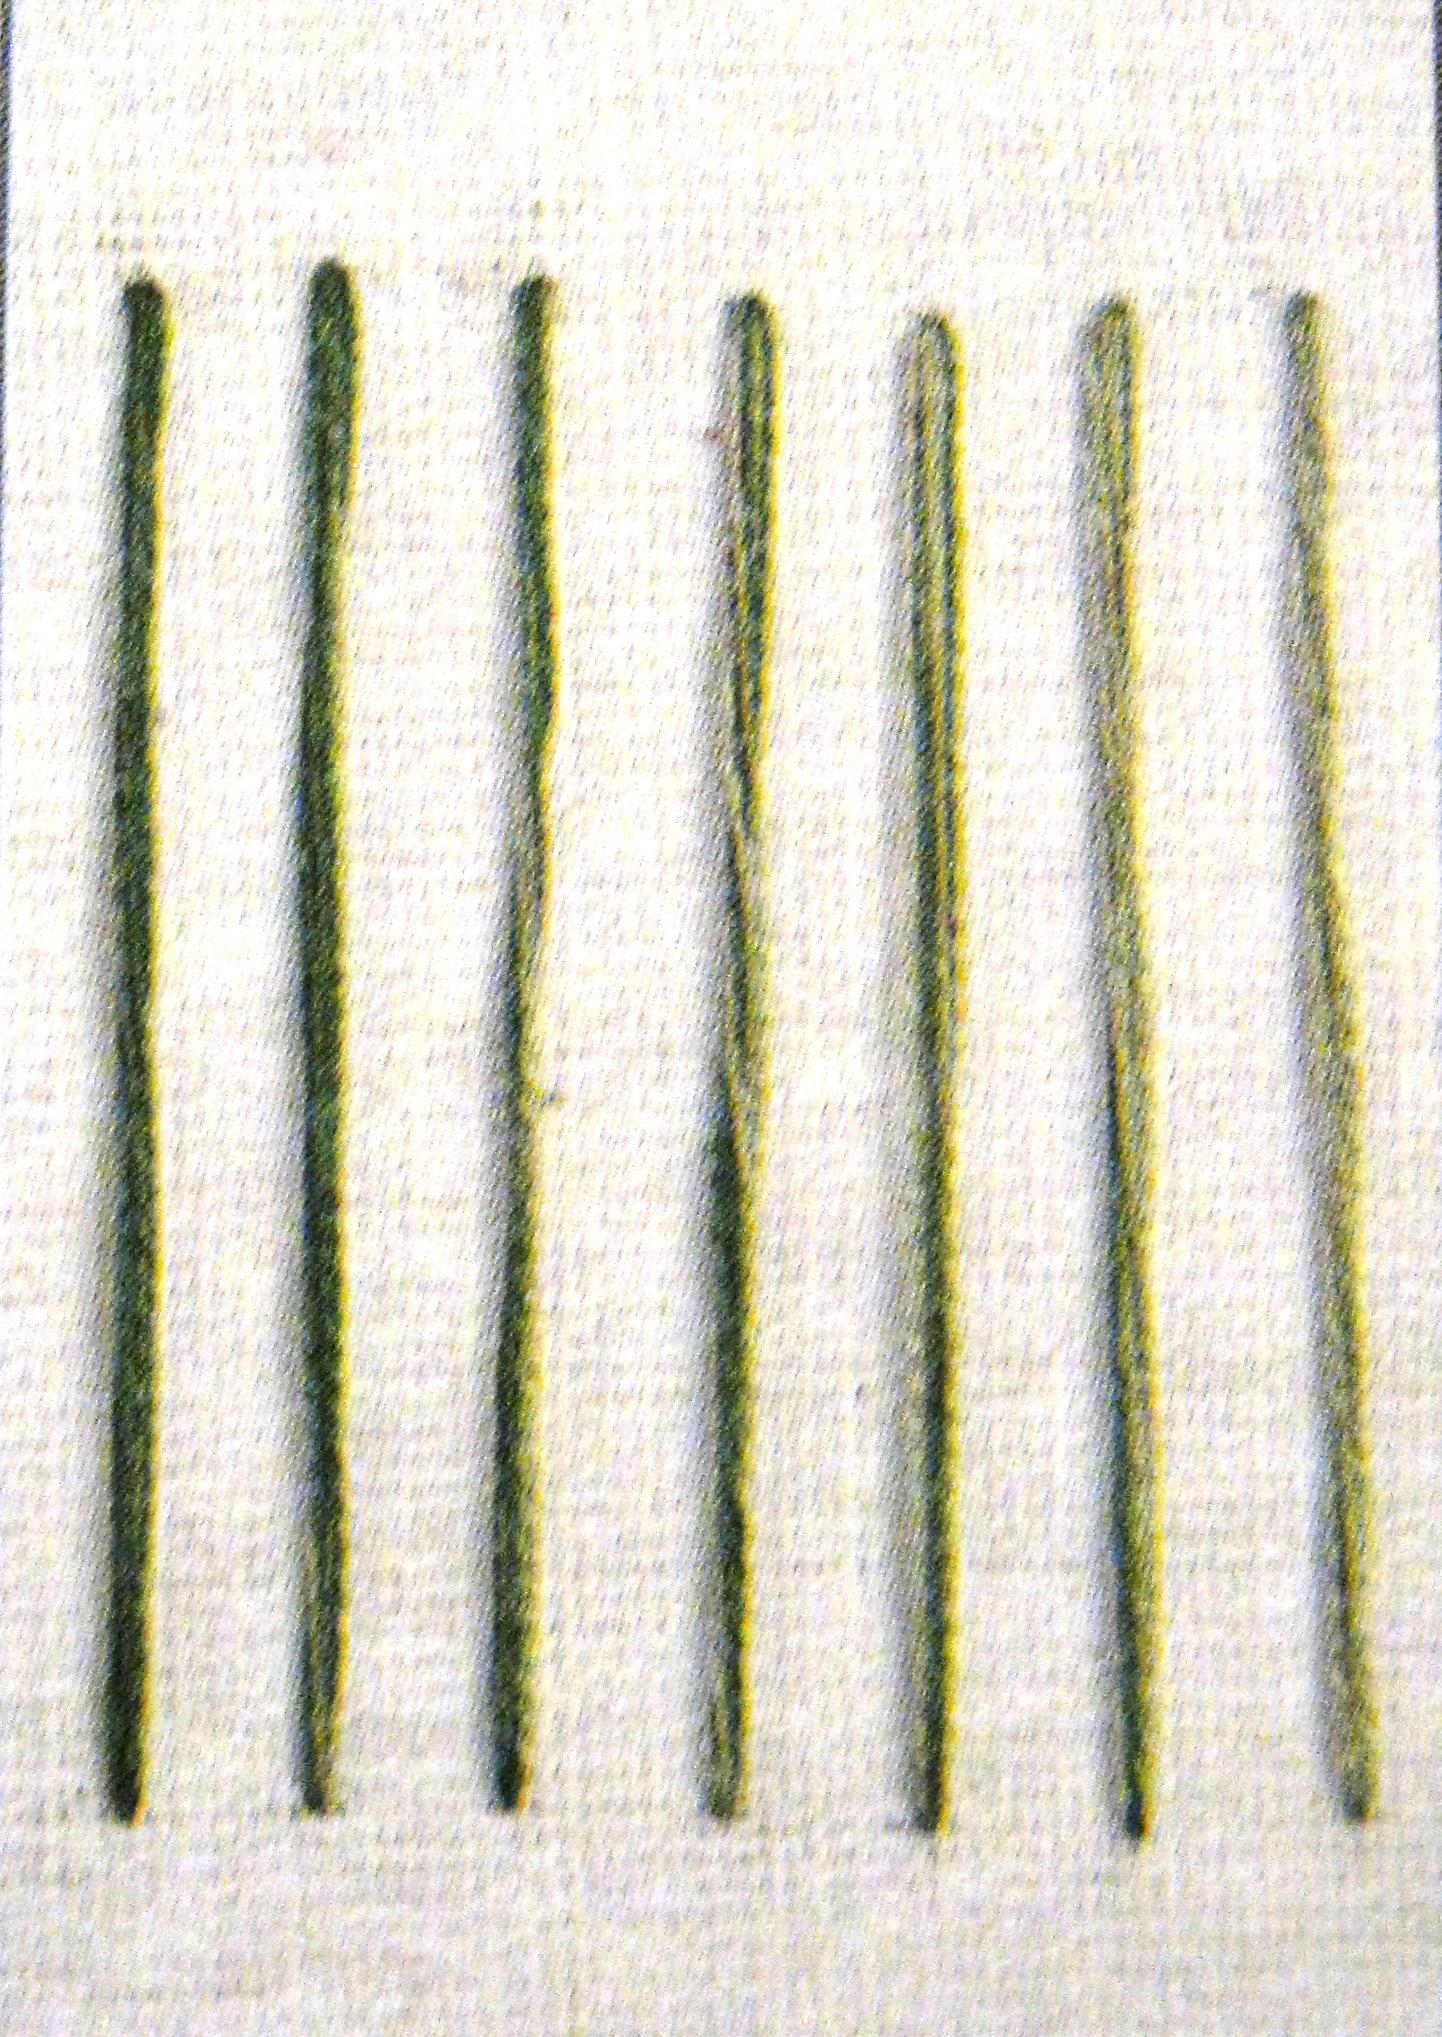 схема плетения стебелька